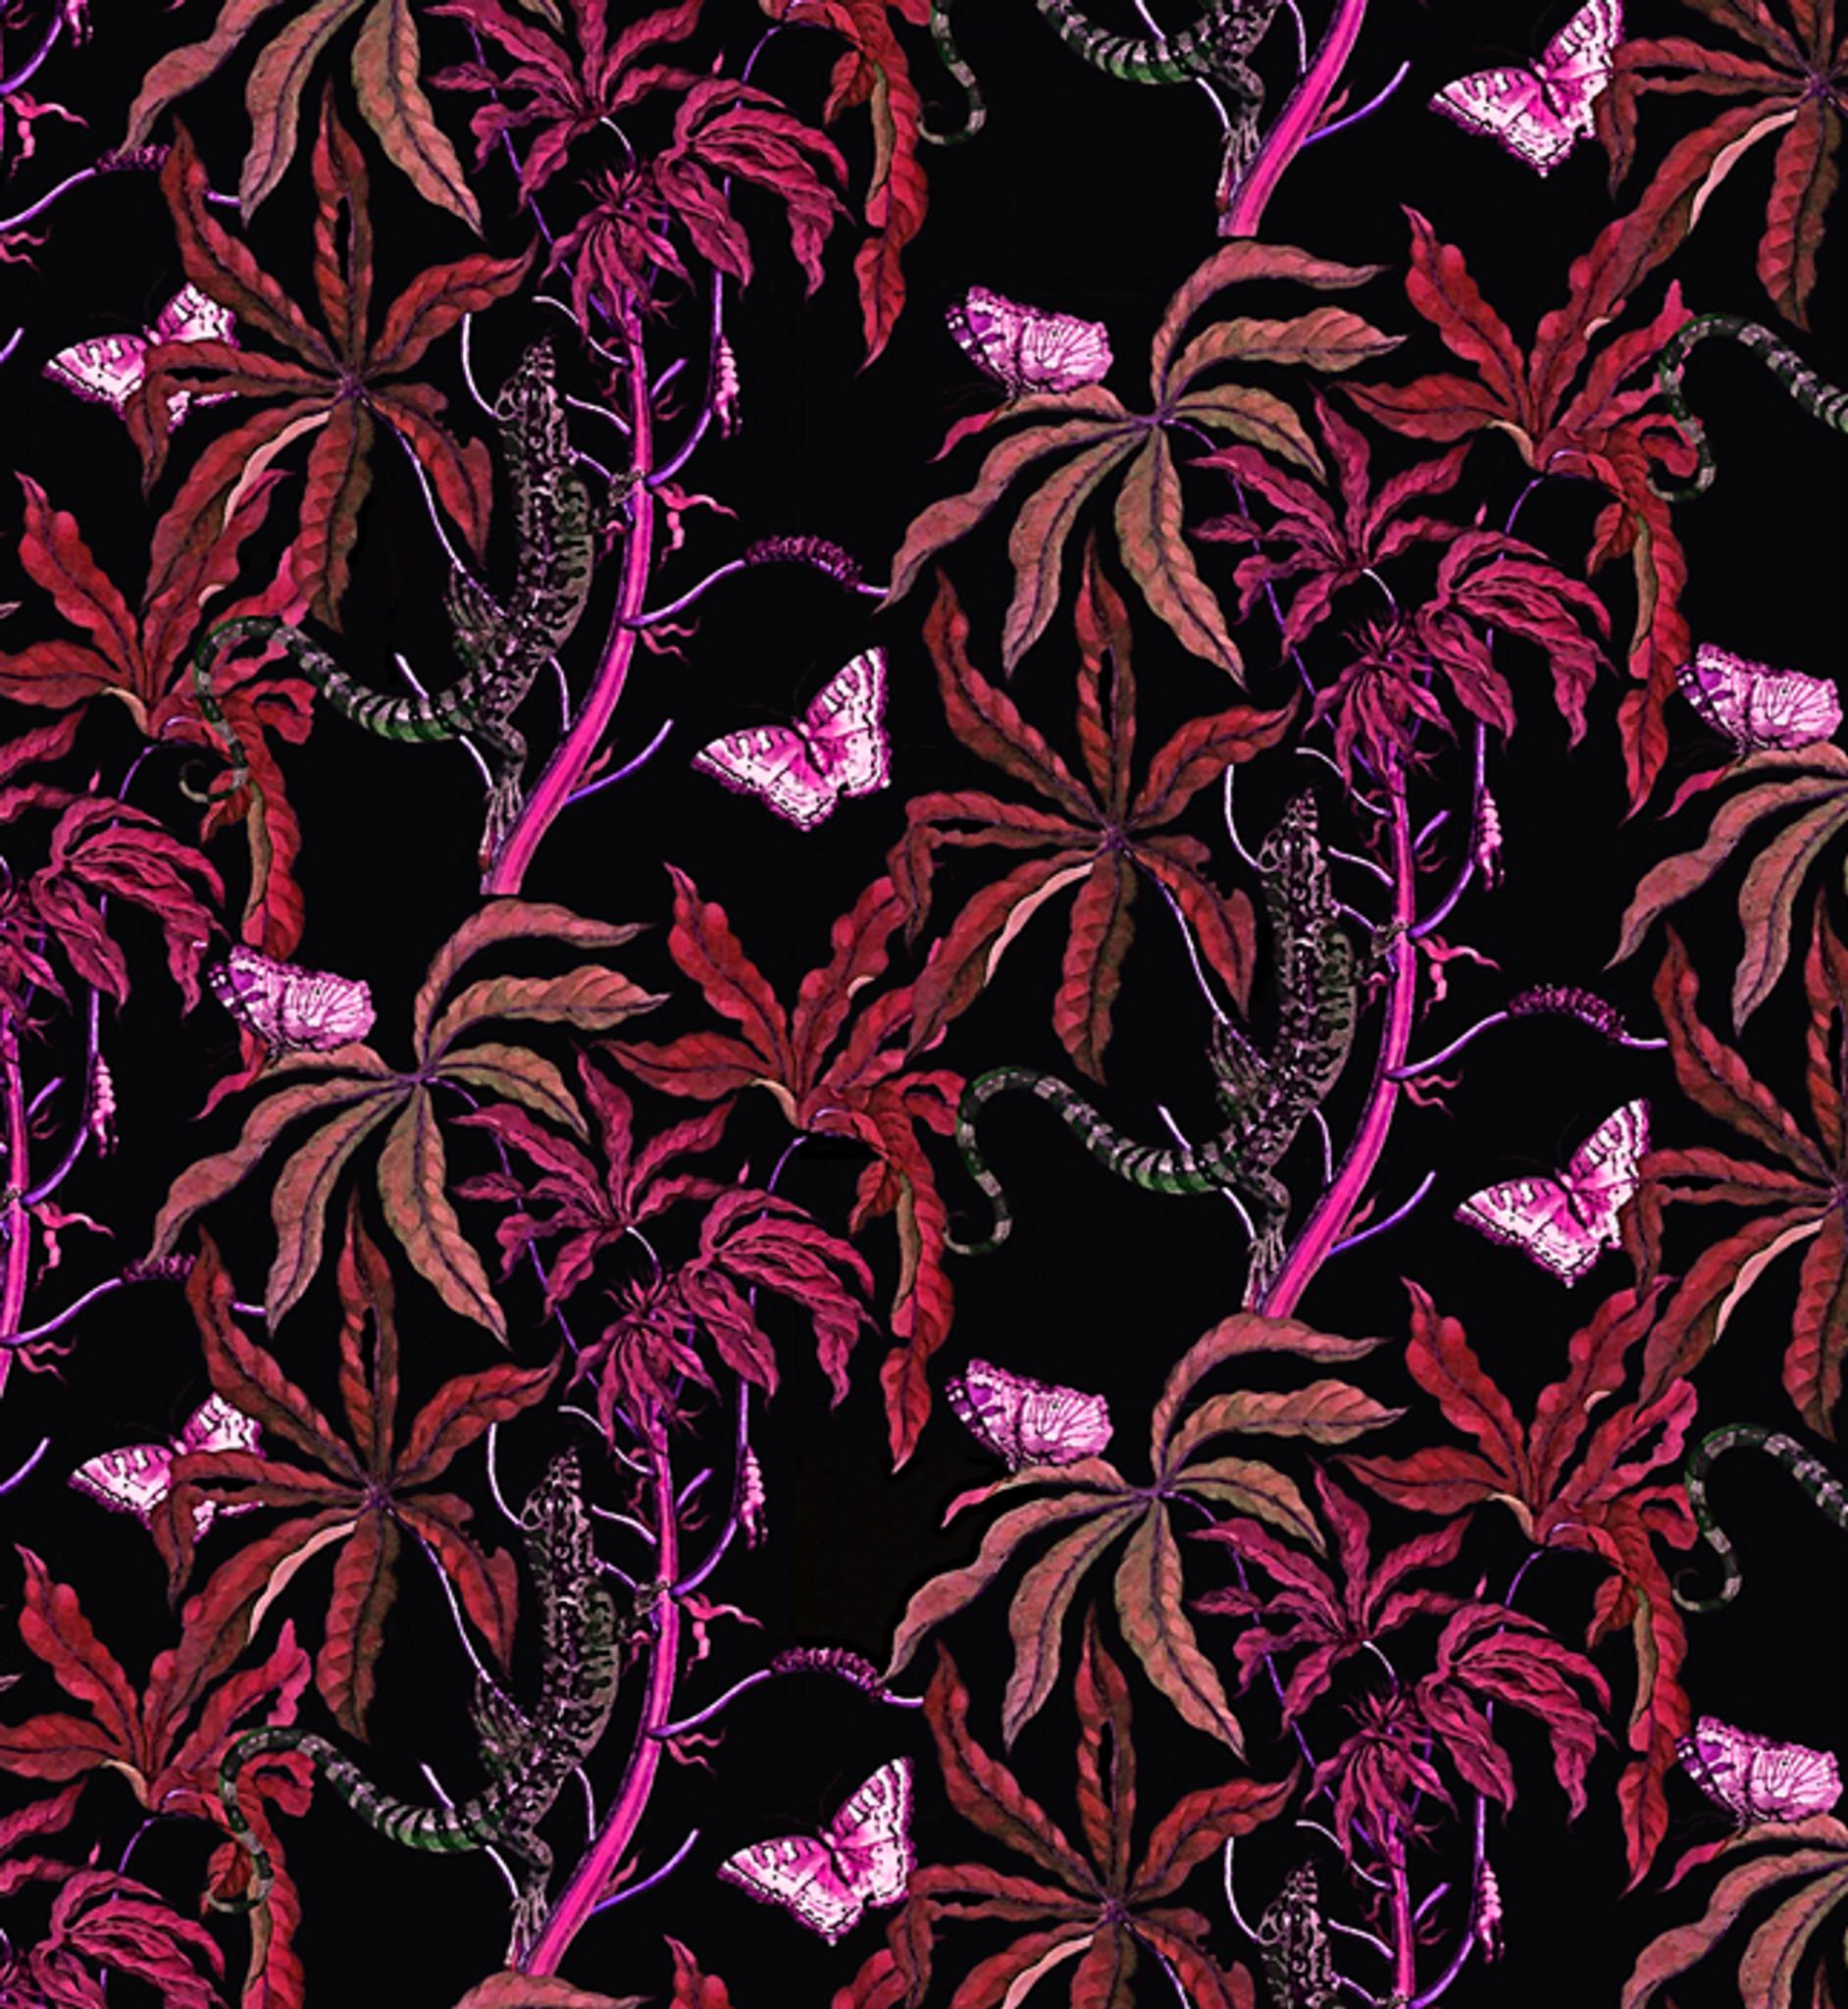 Fabric - Reptiles in the Dark - Pink